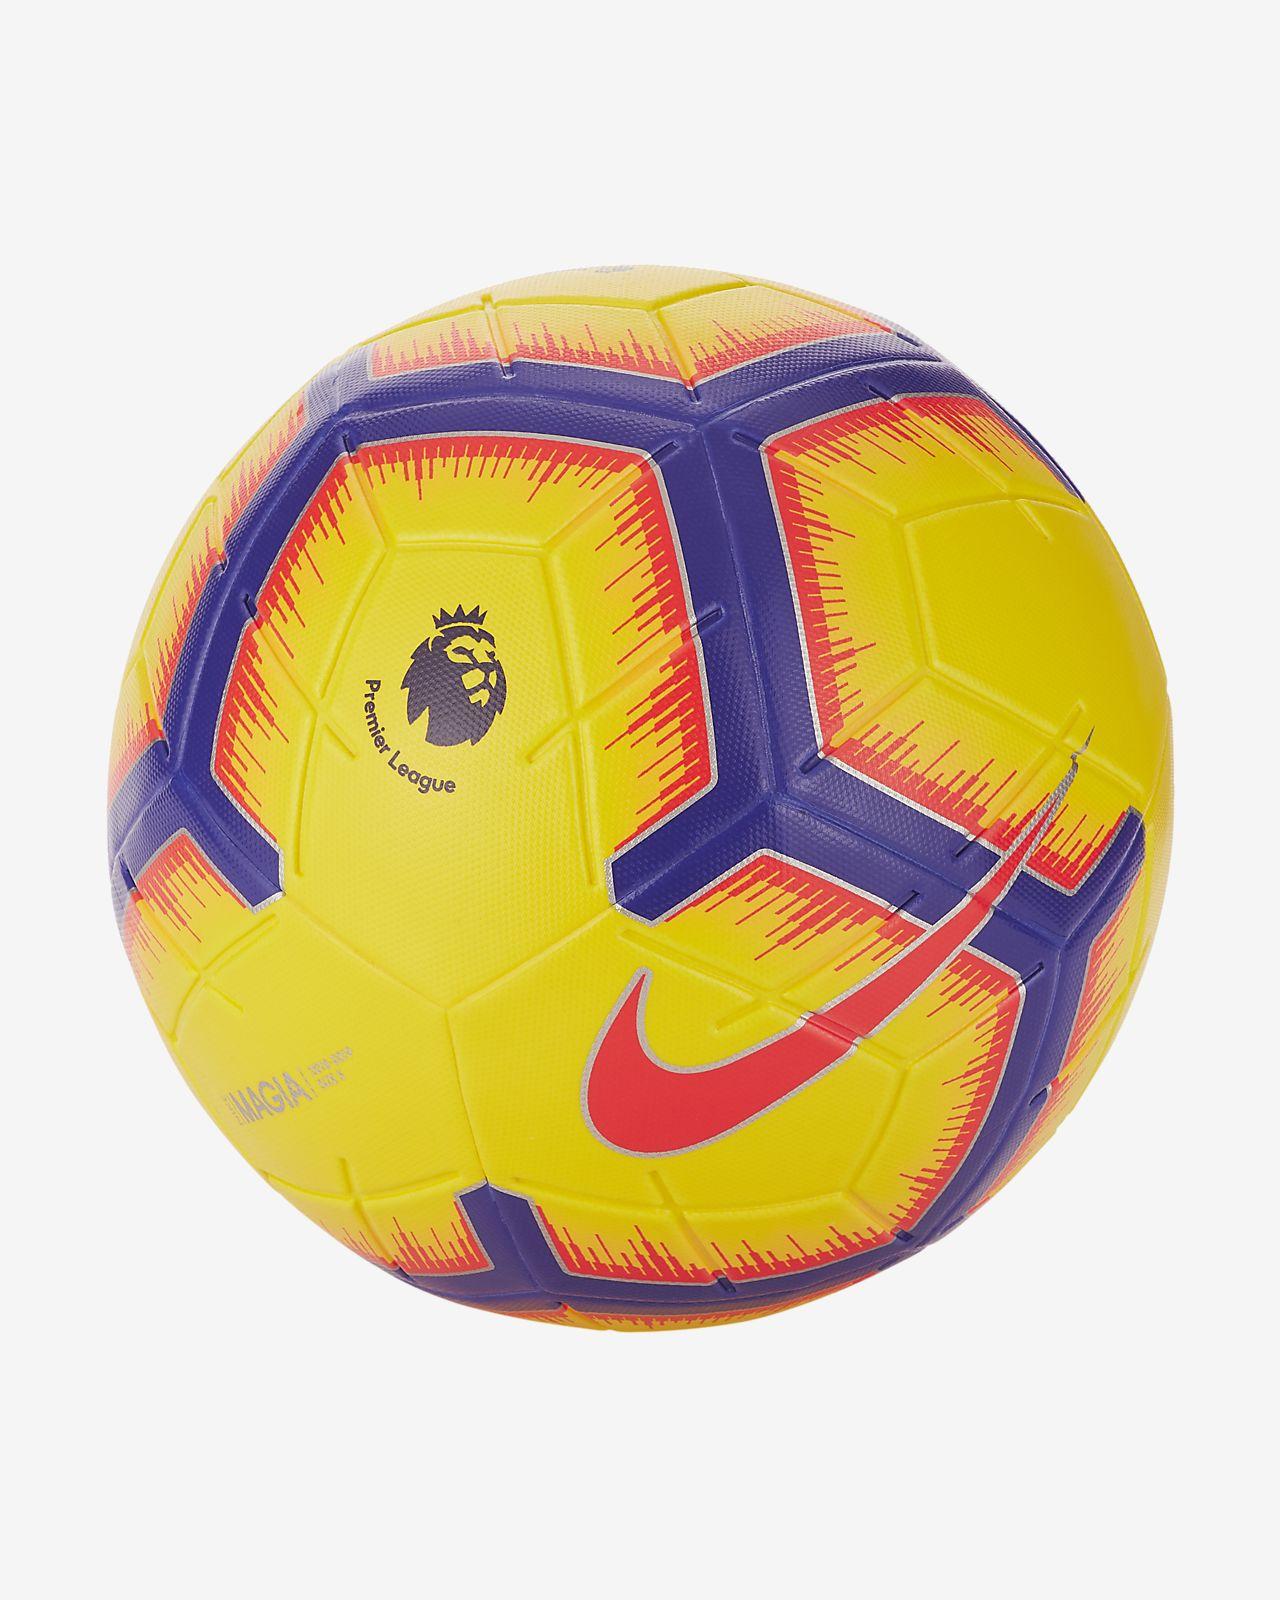 d8f24feff Bola de futebol Premier League Magia. Nike.com PT